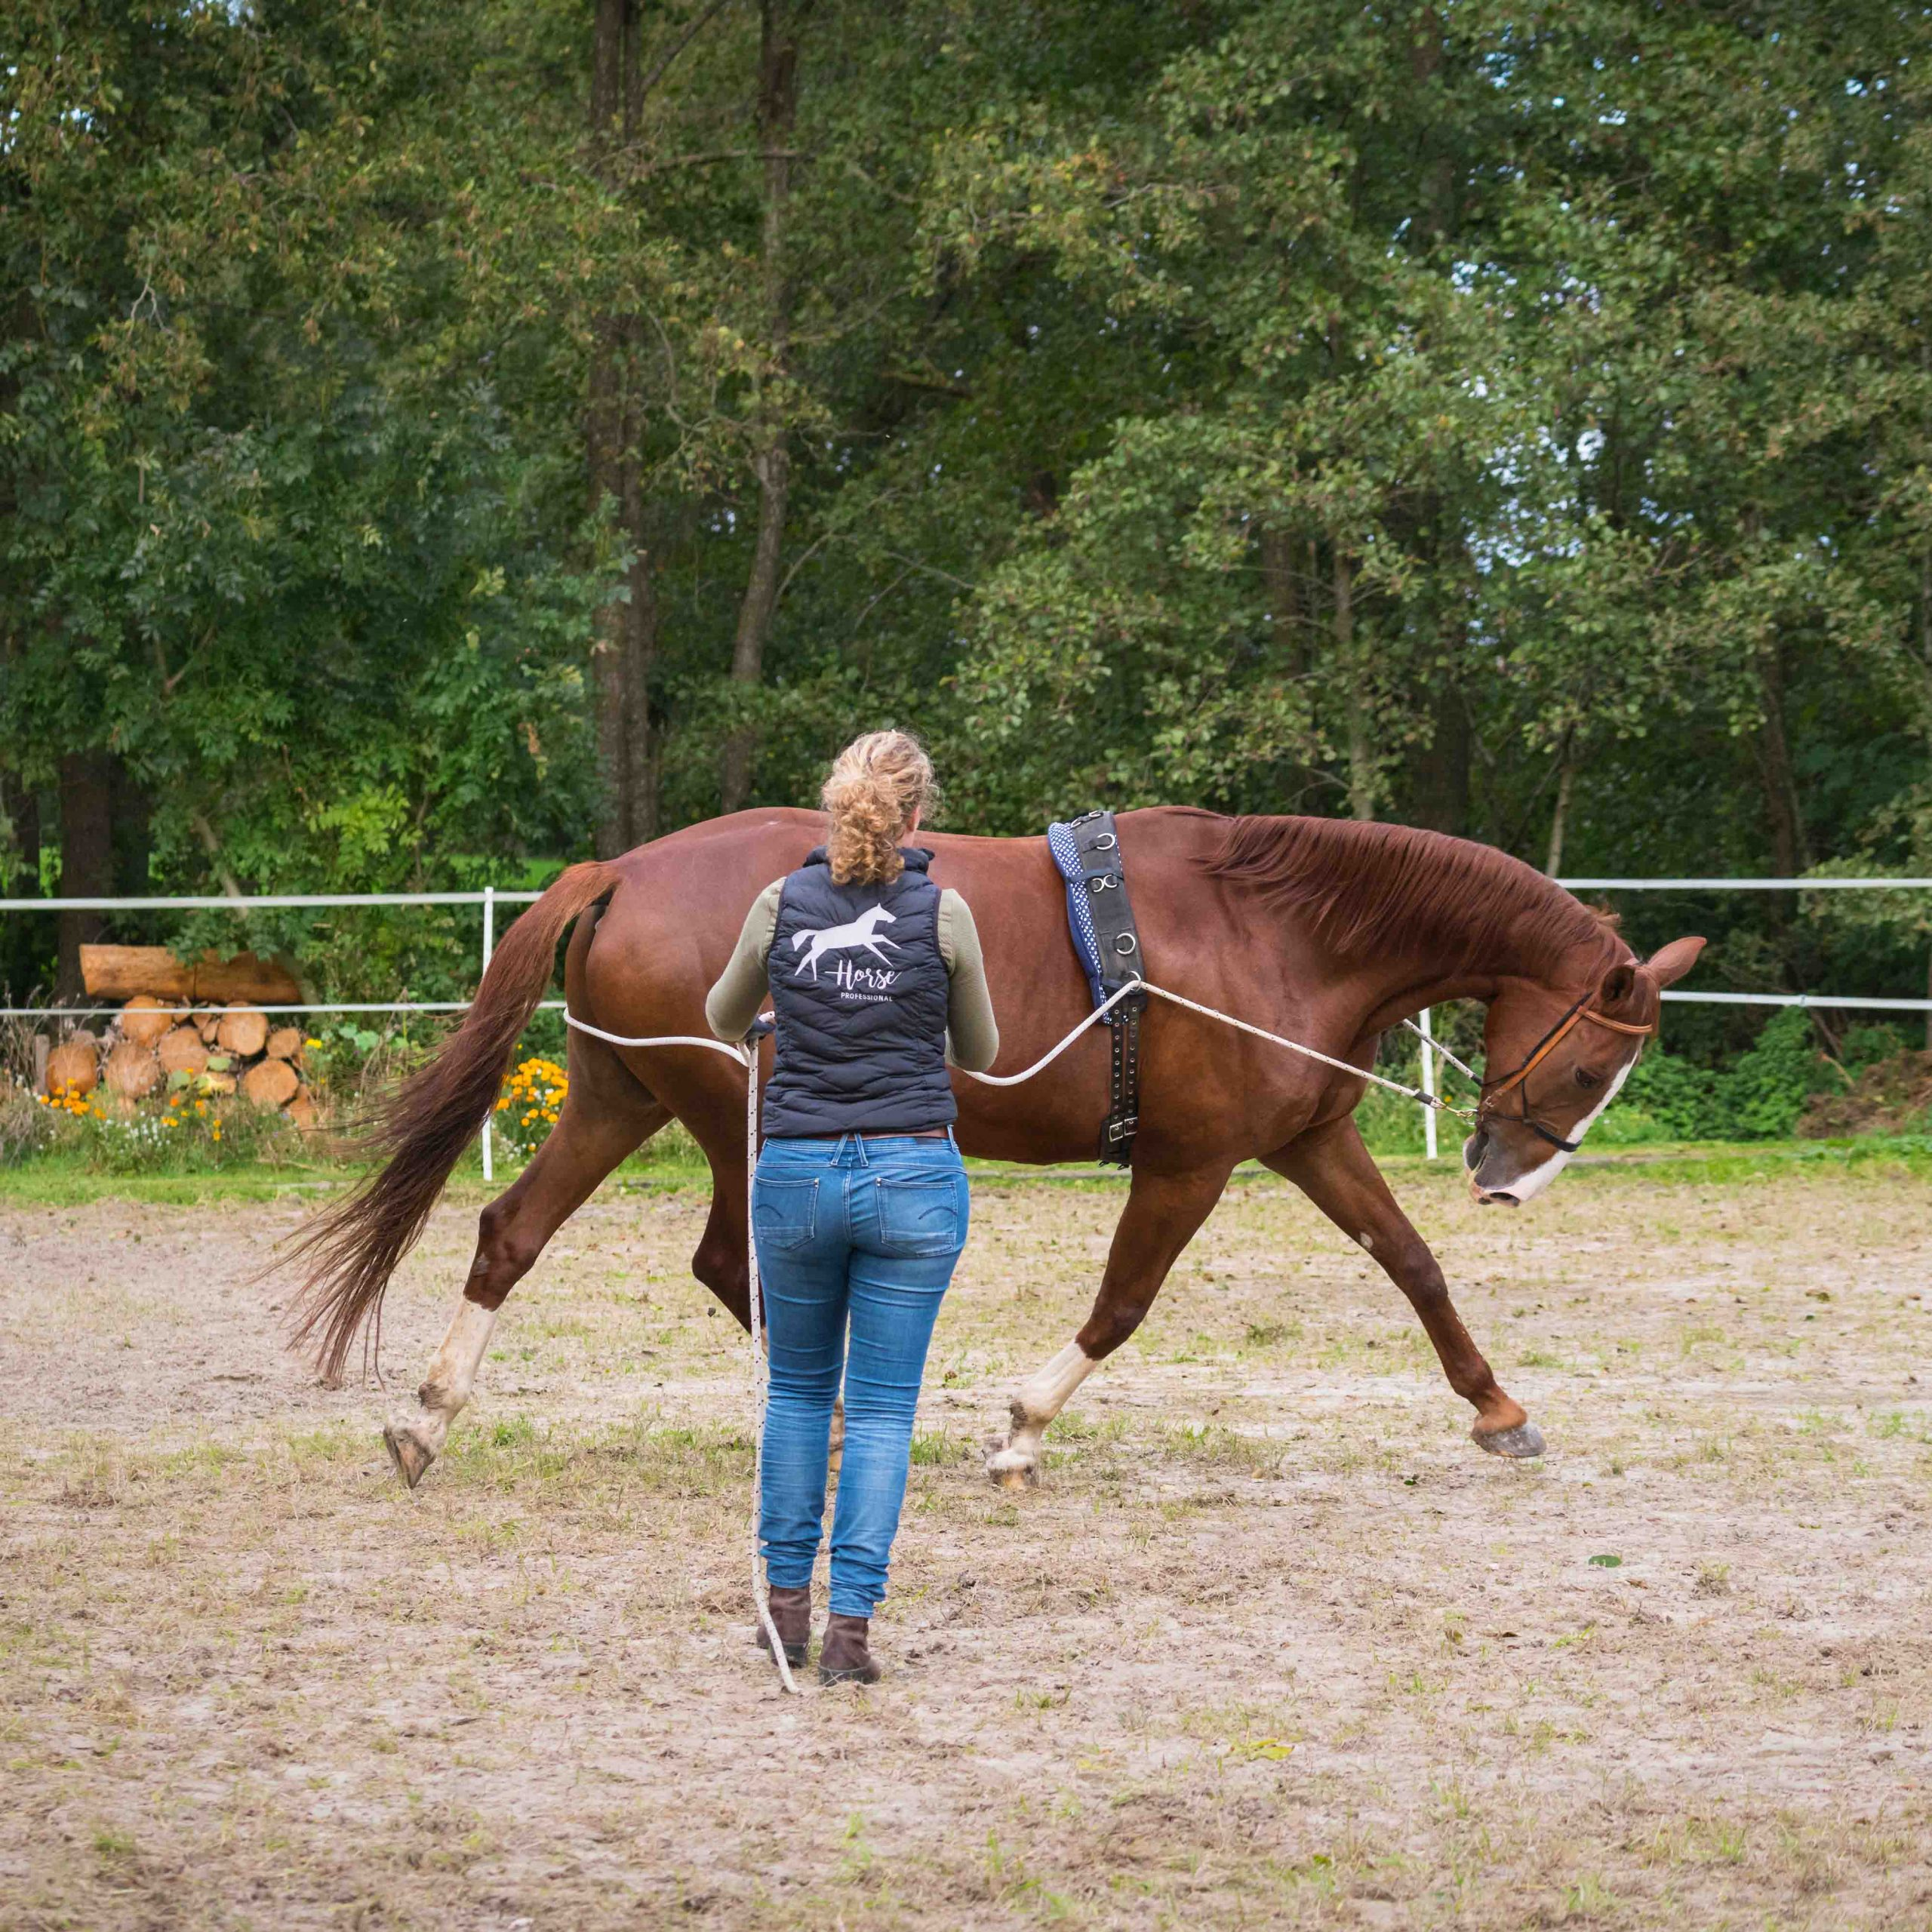 HorseProfessional-Dubbele lange lijnen